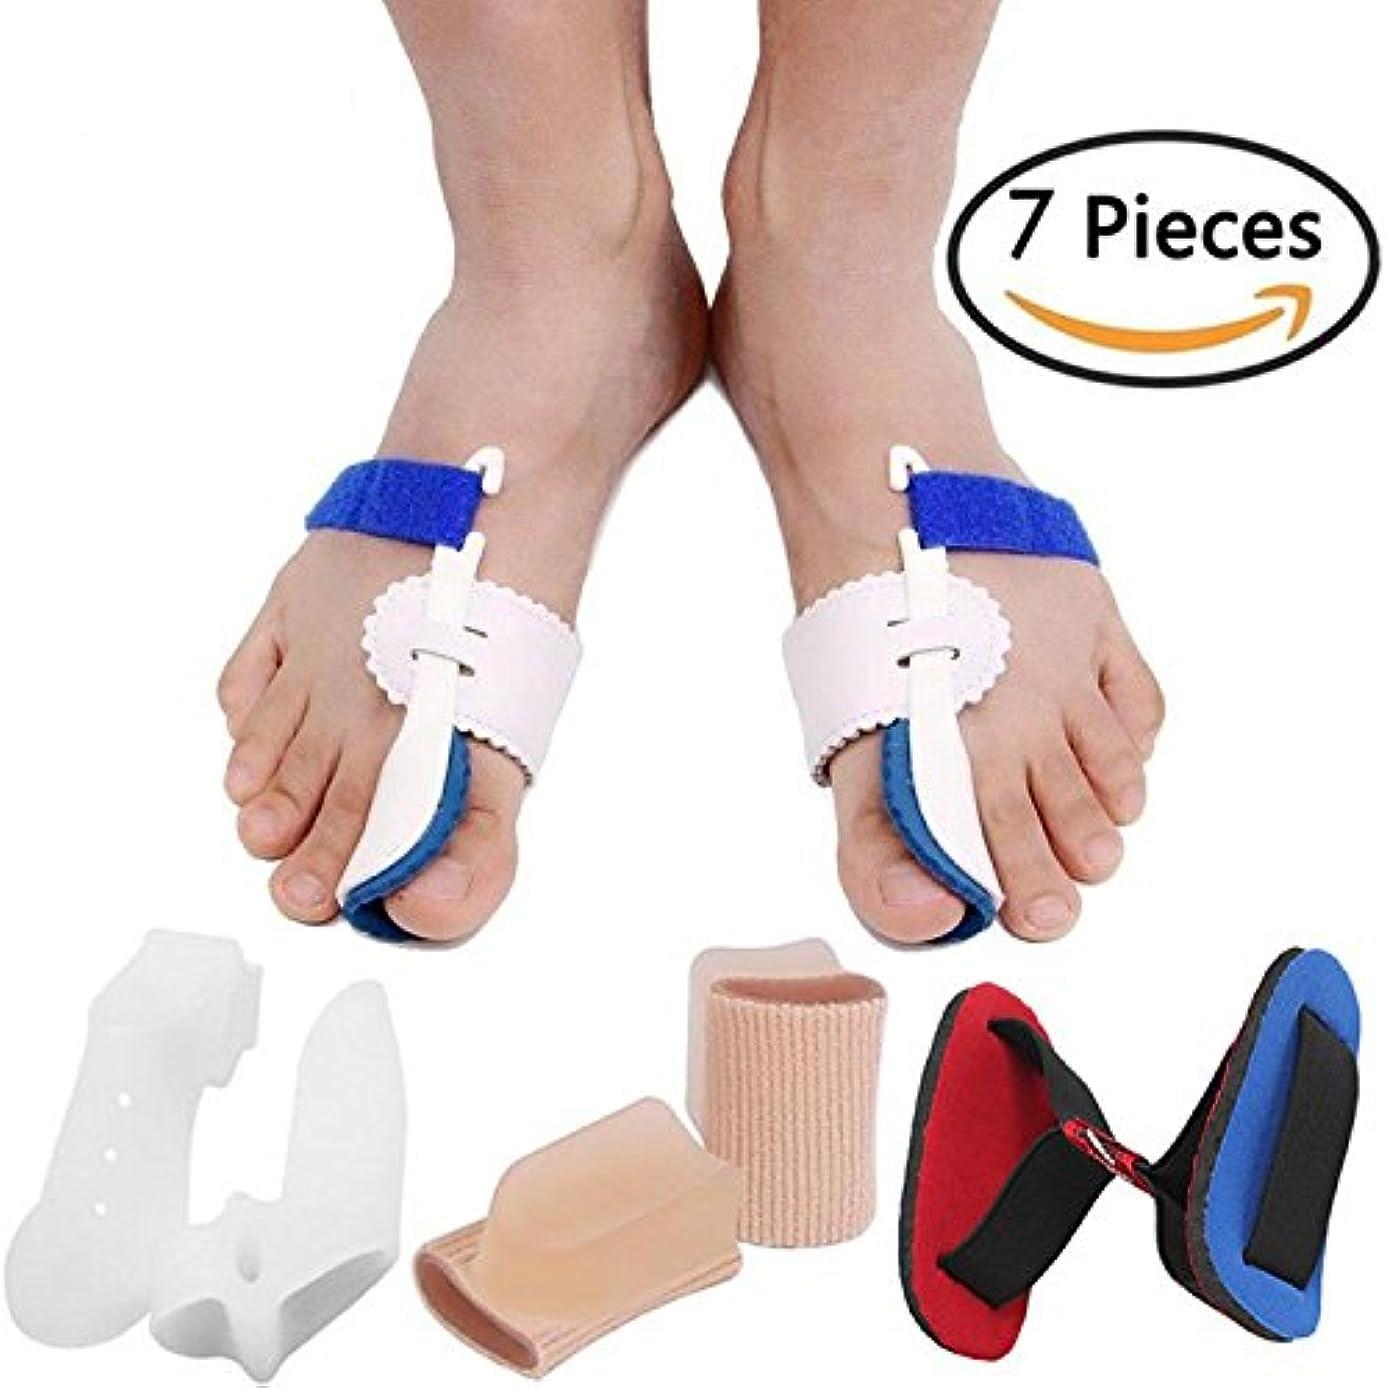 Bunion Corrector Bunion Relief Protector Sleeves Kit, Big Toe Corrector Straightener Separator Treat Pain in Hallux...